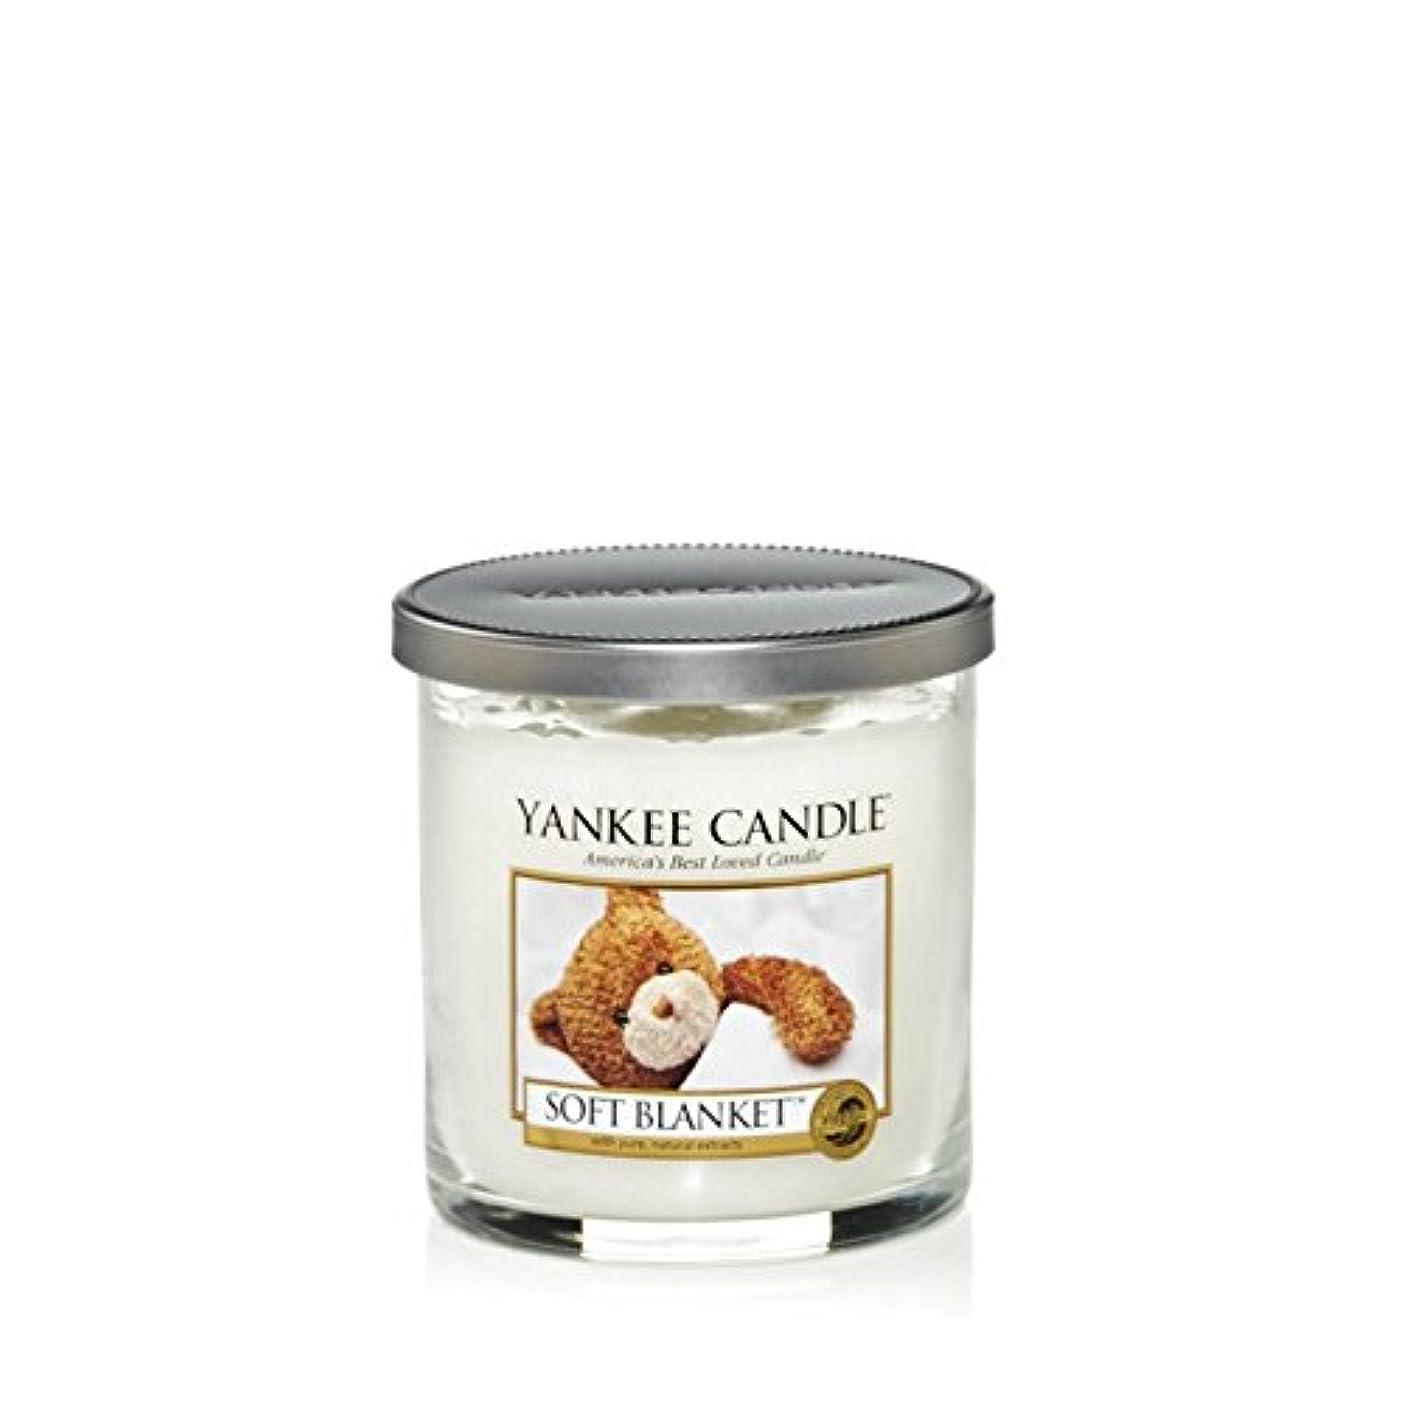 Yankee Candles Small Pillar Candle - Soft Blanket (Pack of 6) - ヤンキーキャンドルの小さな柱キャンドル - ソフト毛布 (x6) [並行輸入品]